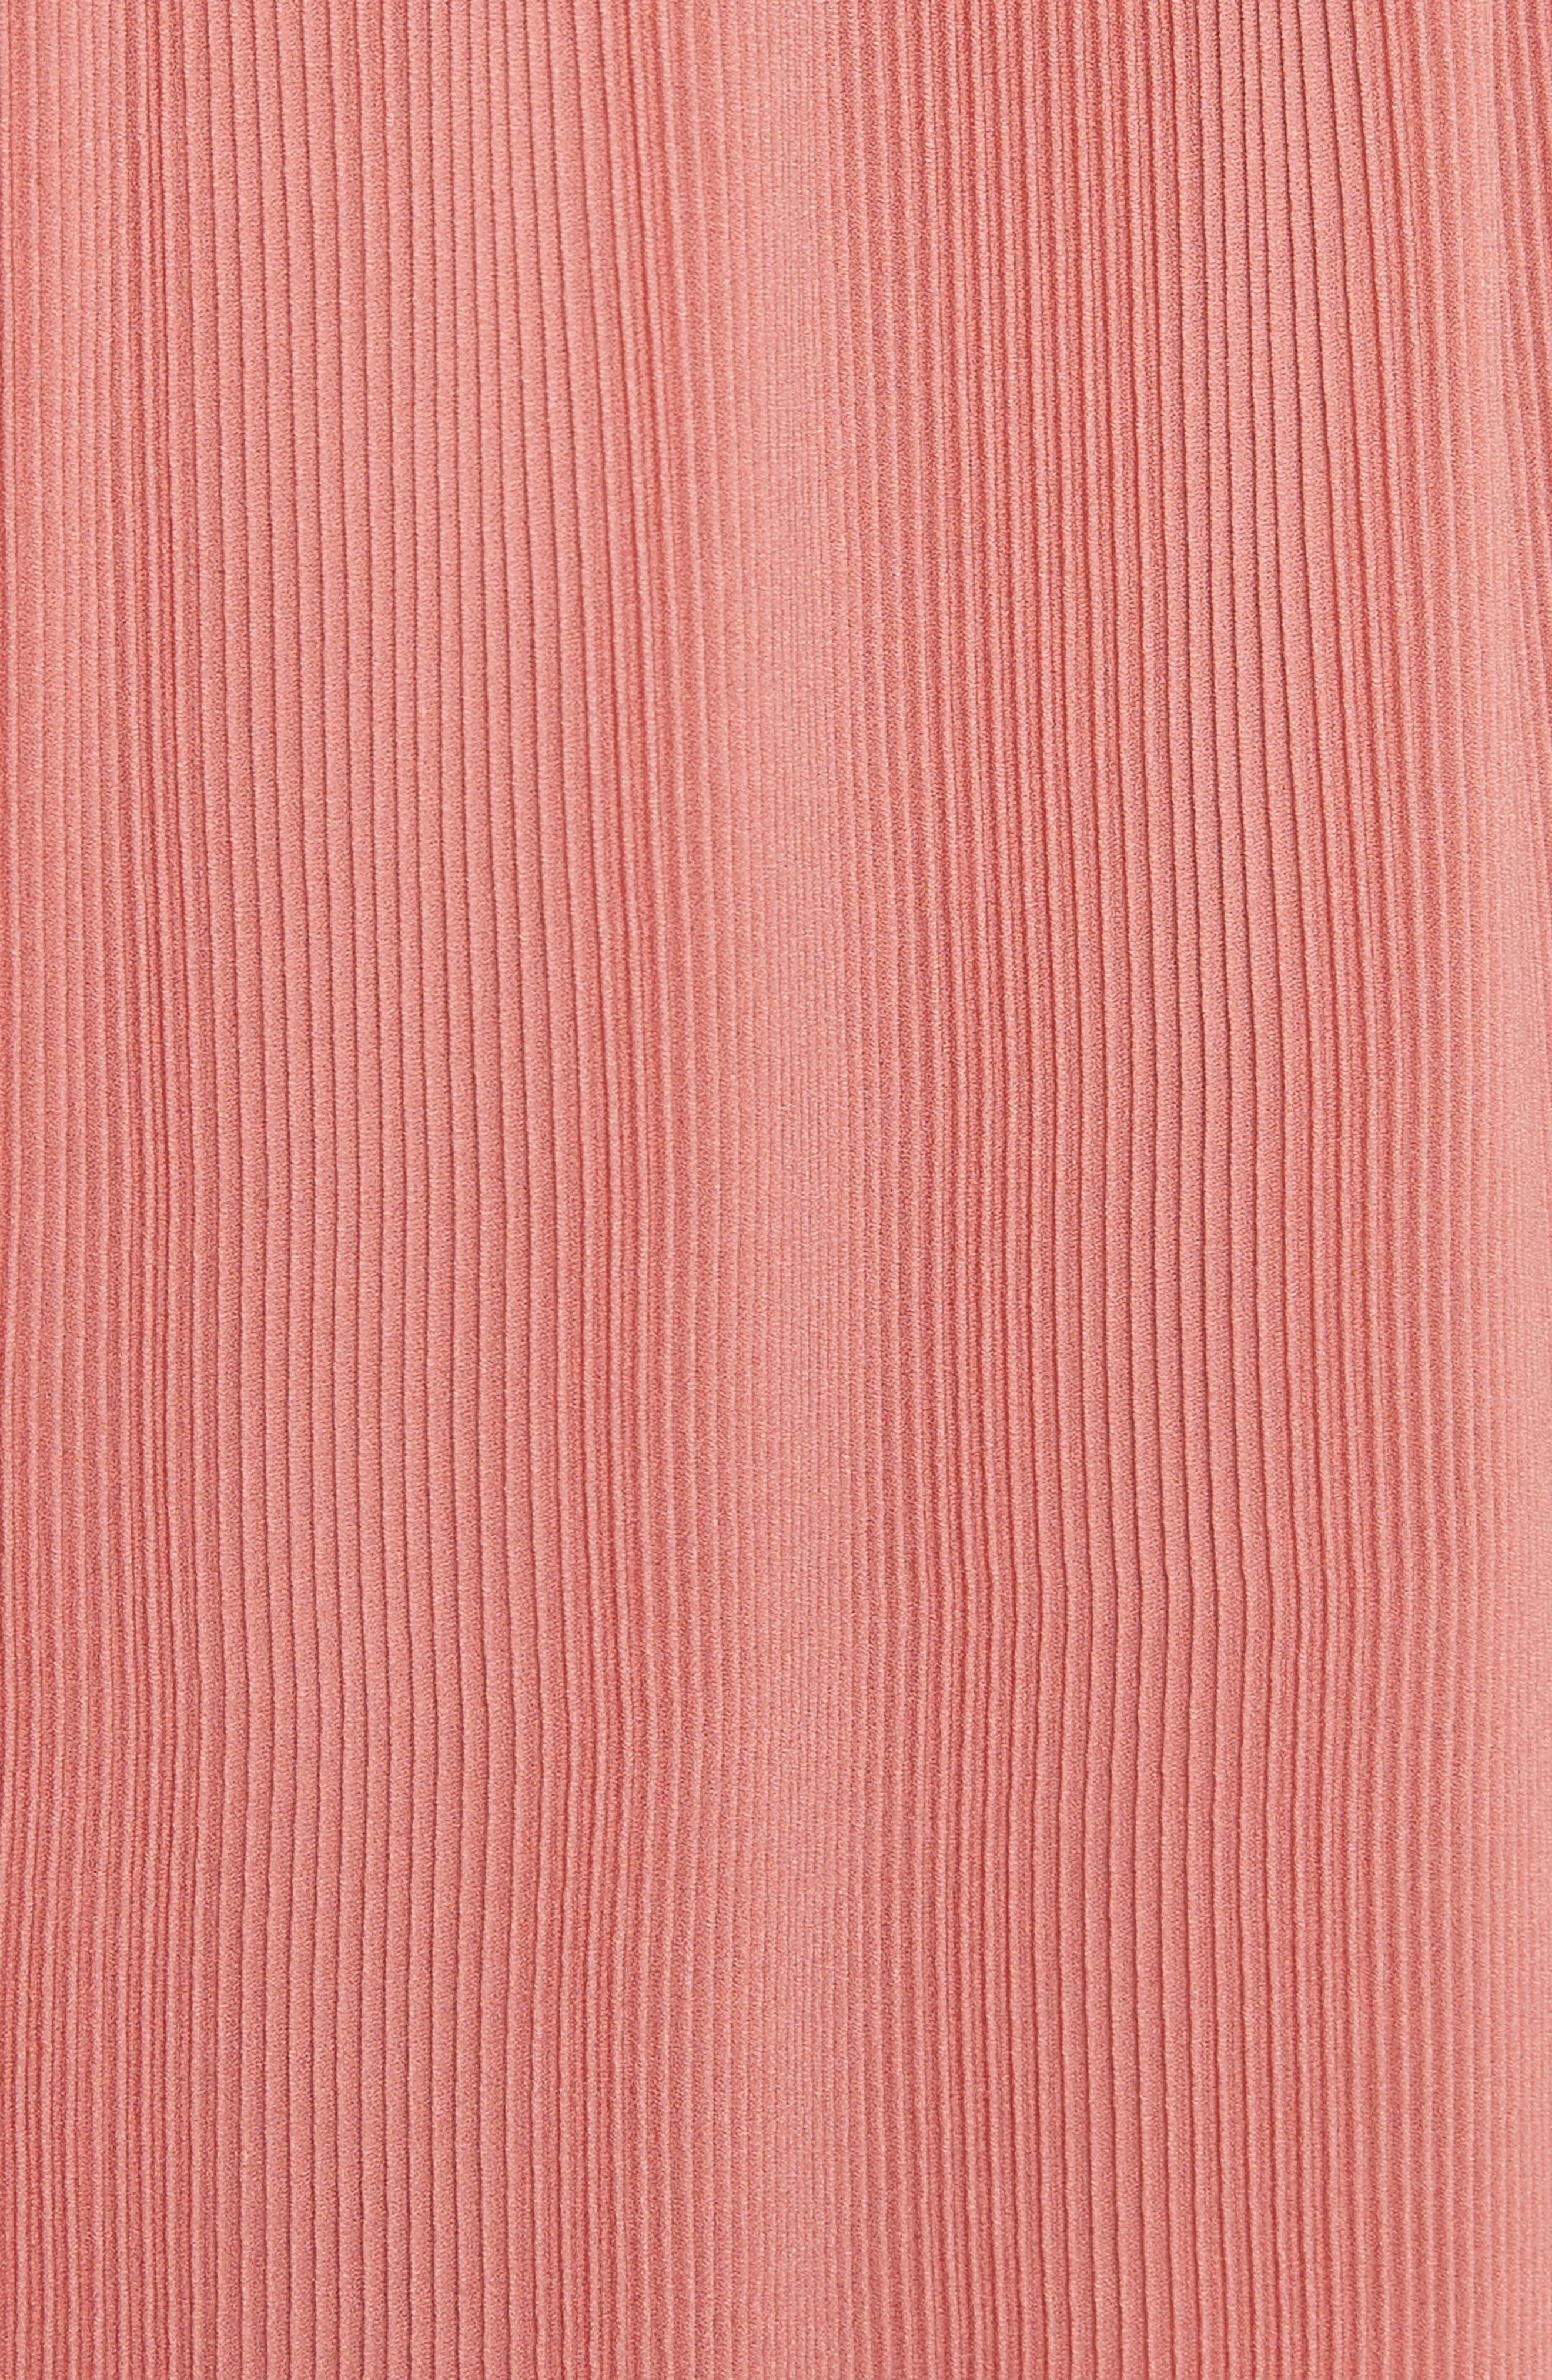 Colorblock Pleated Dress,                             Alternate thumbnail 5, color,                             007